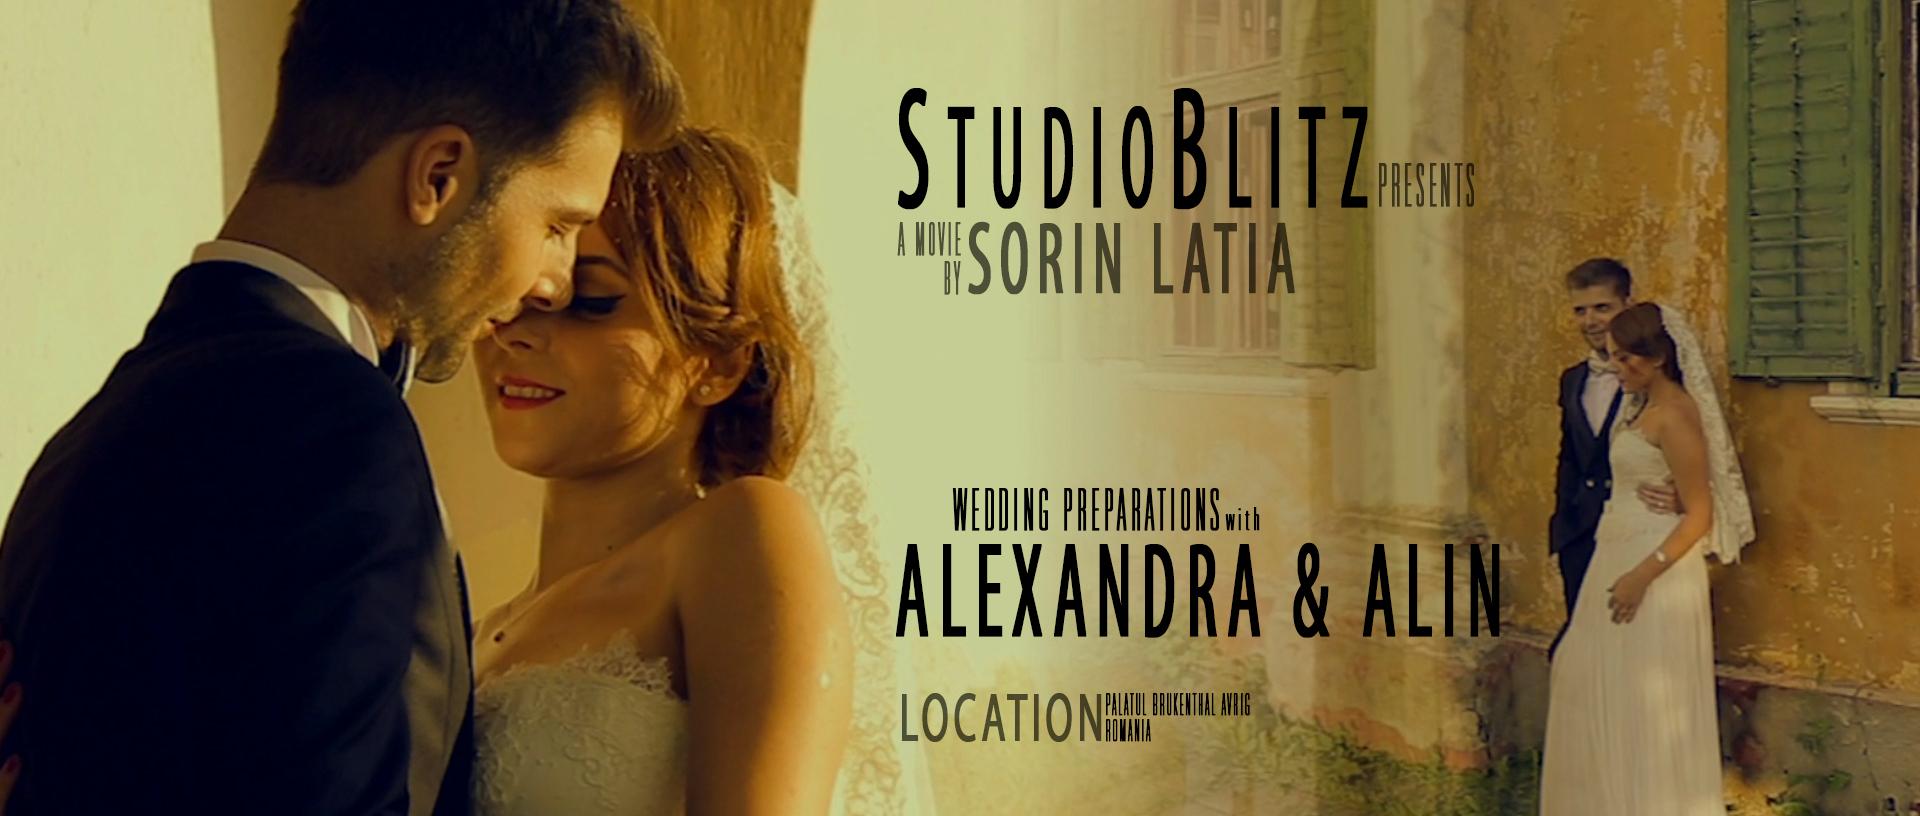 coperta_pregatri-alexandra_vimeo